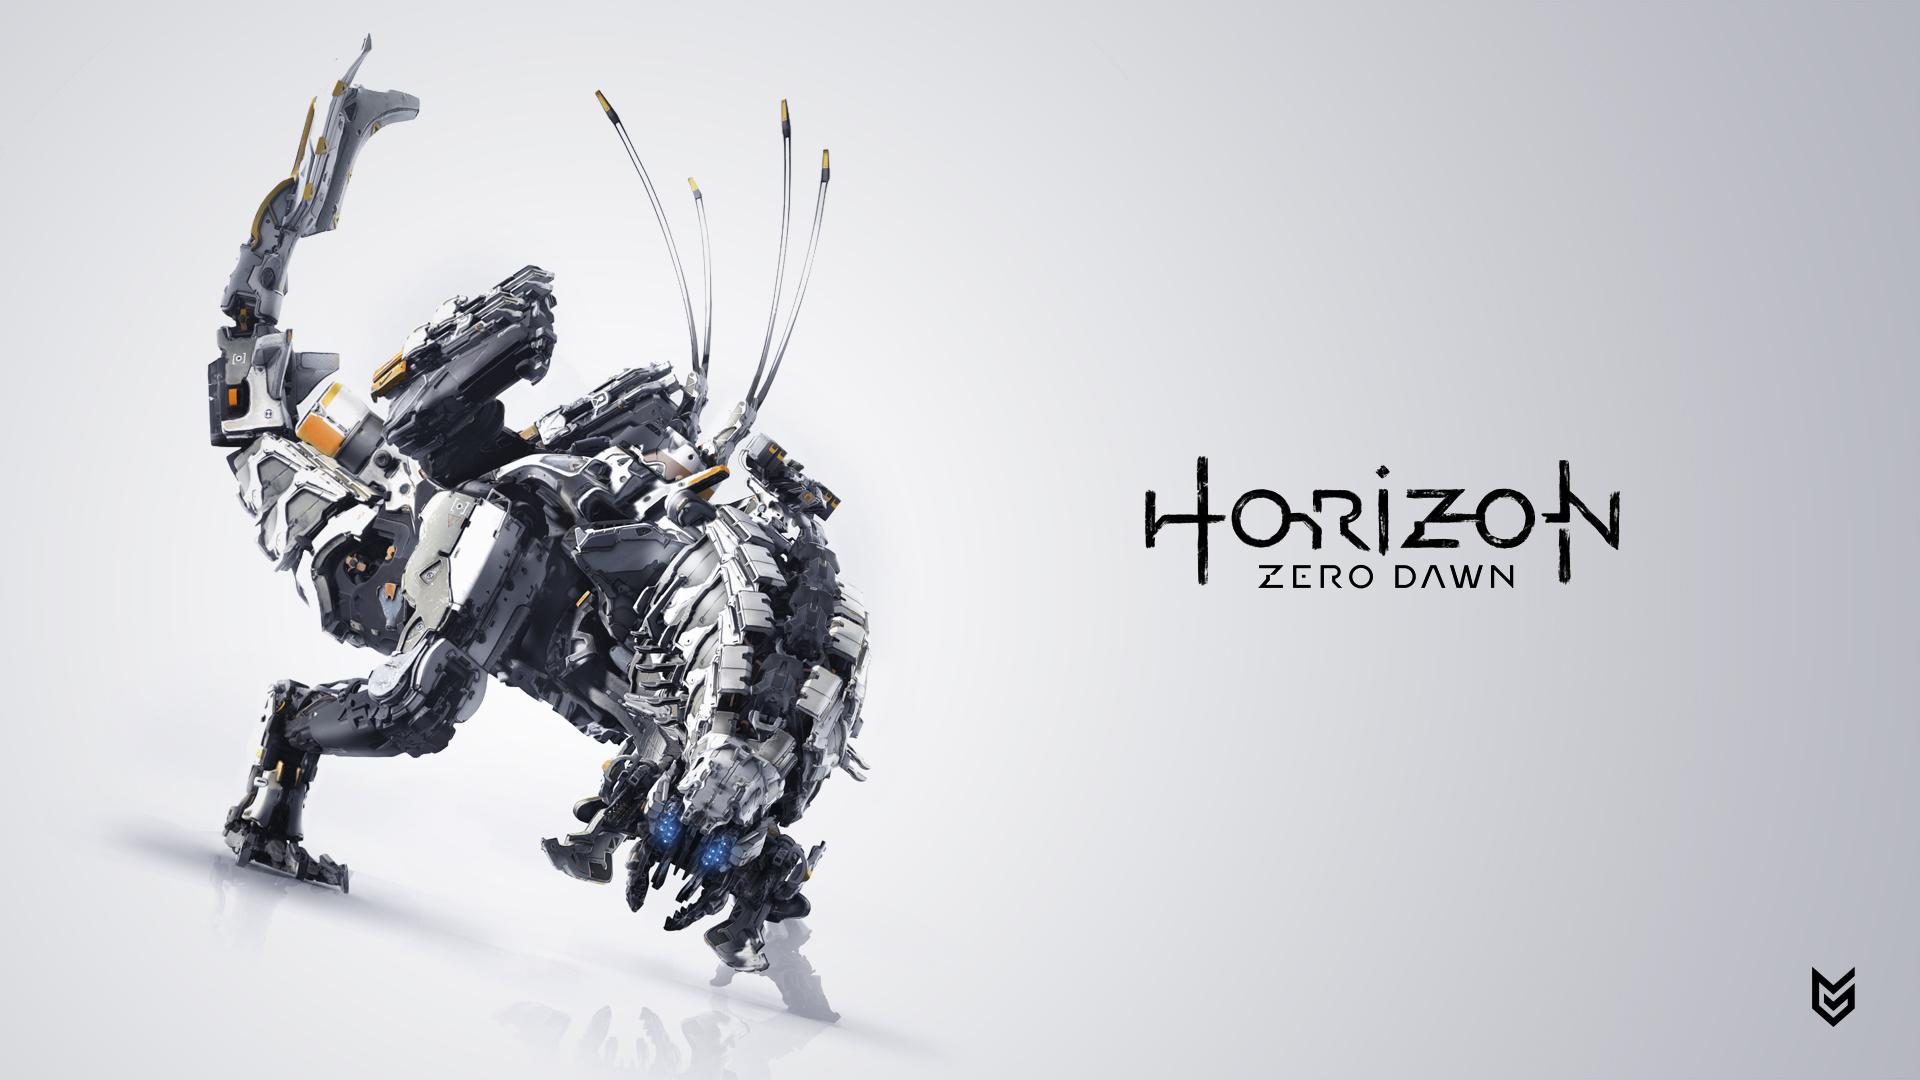 Horizon Zero Dawn Wallpapers HD